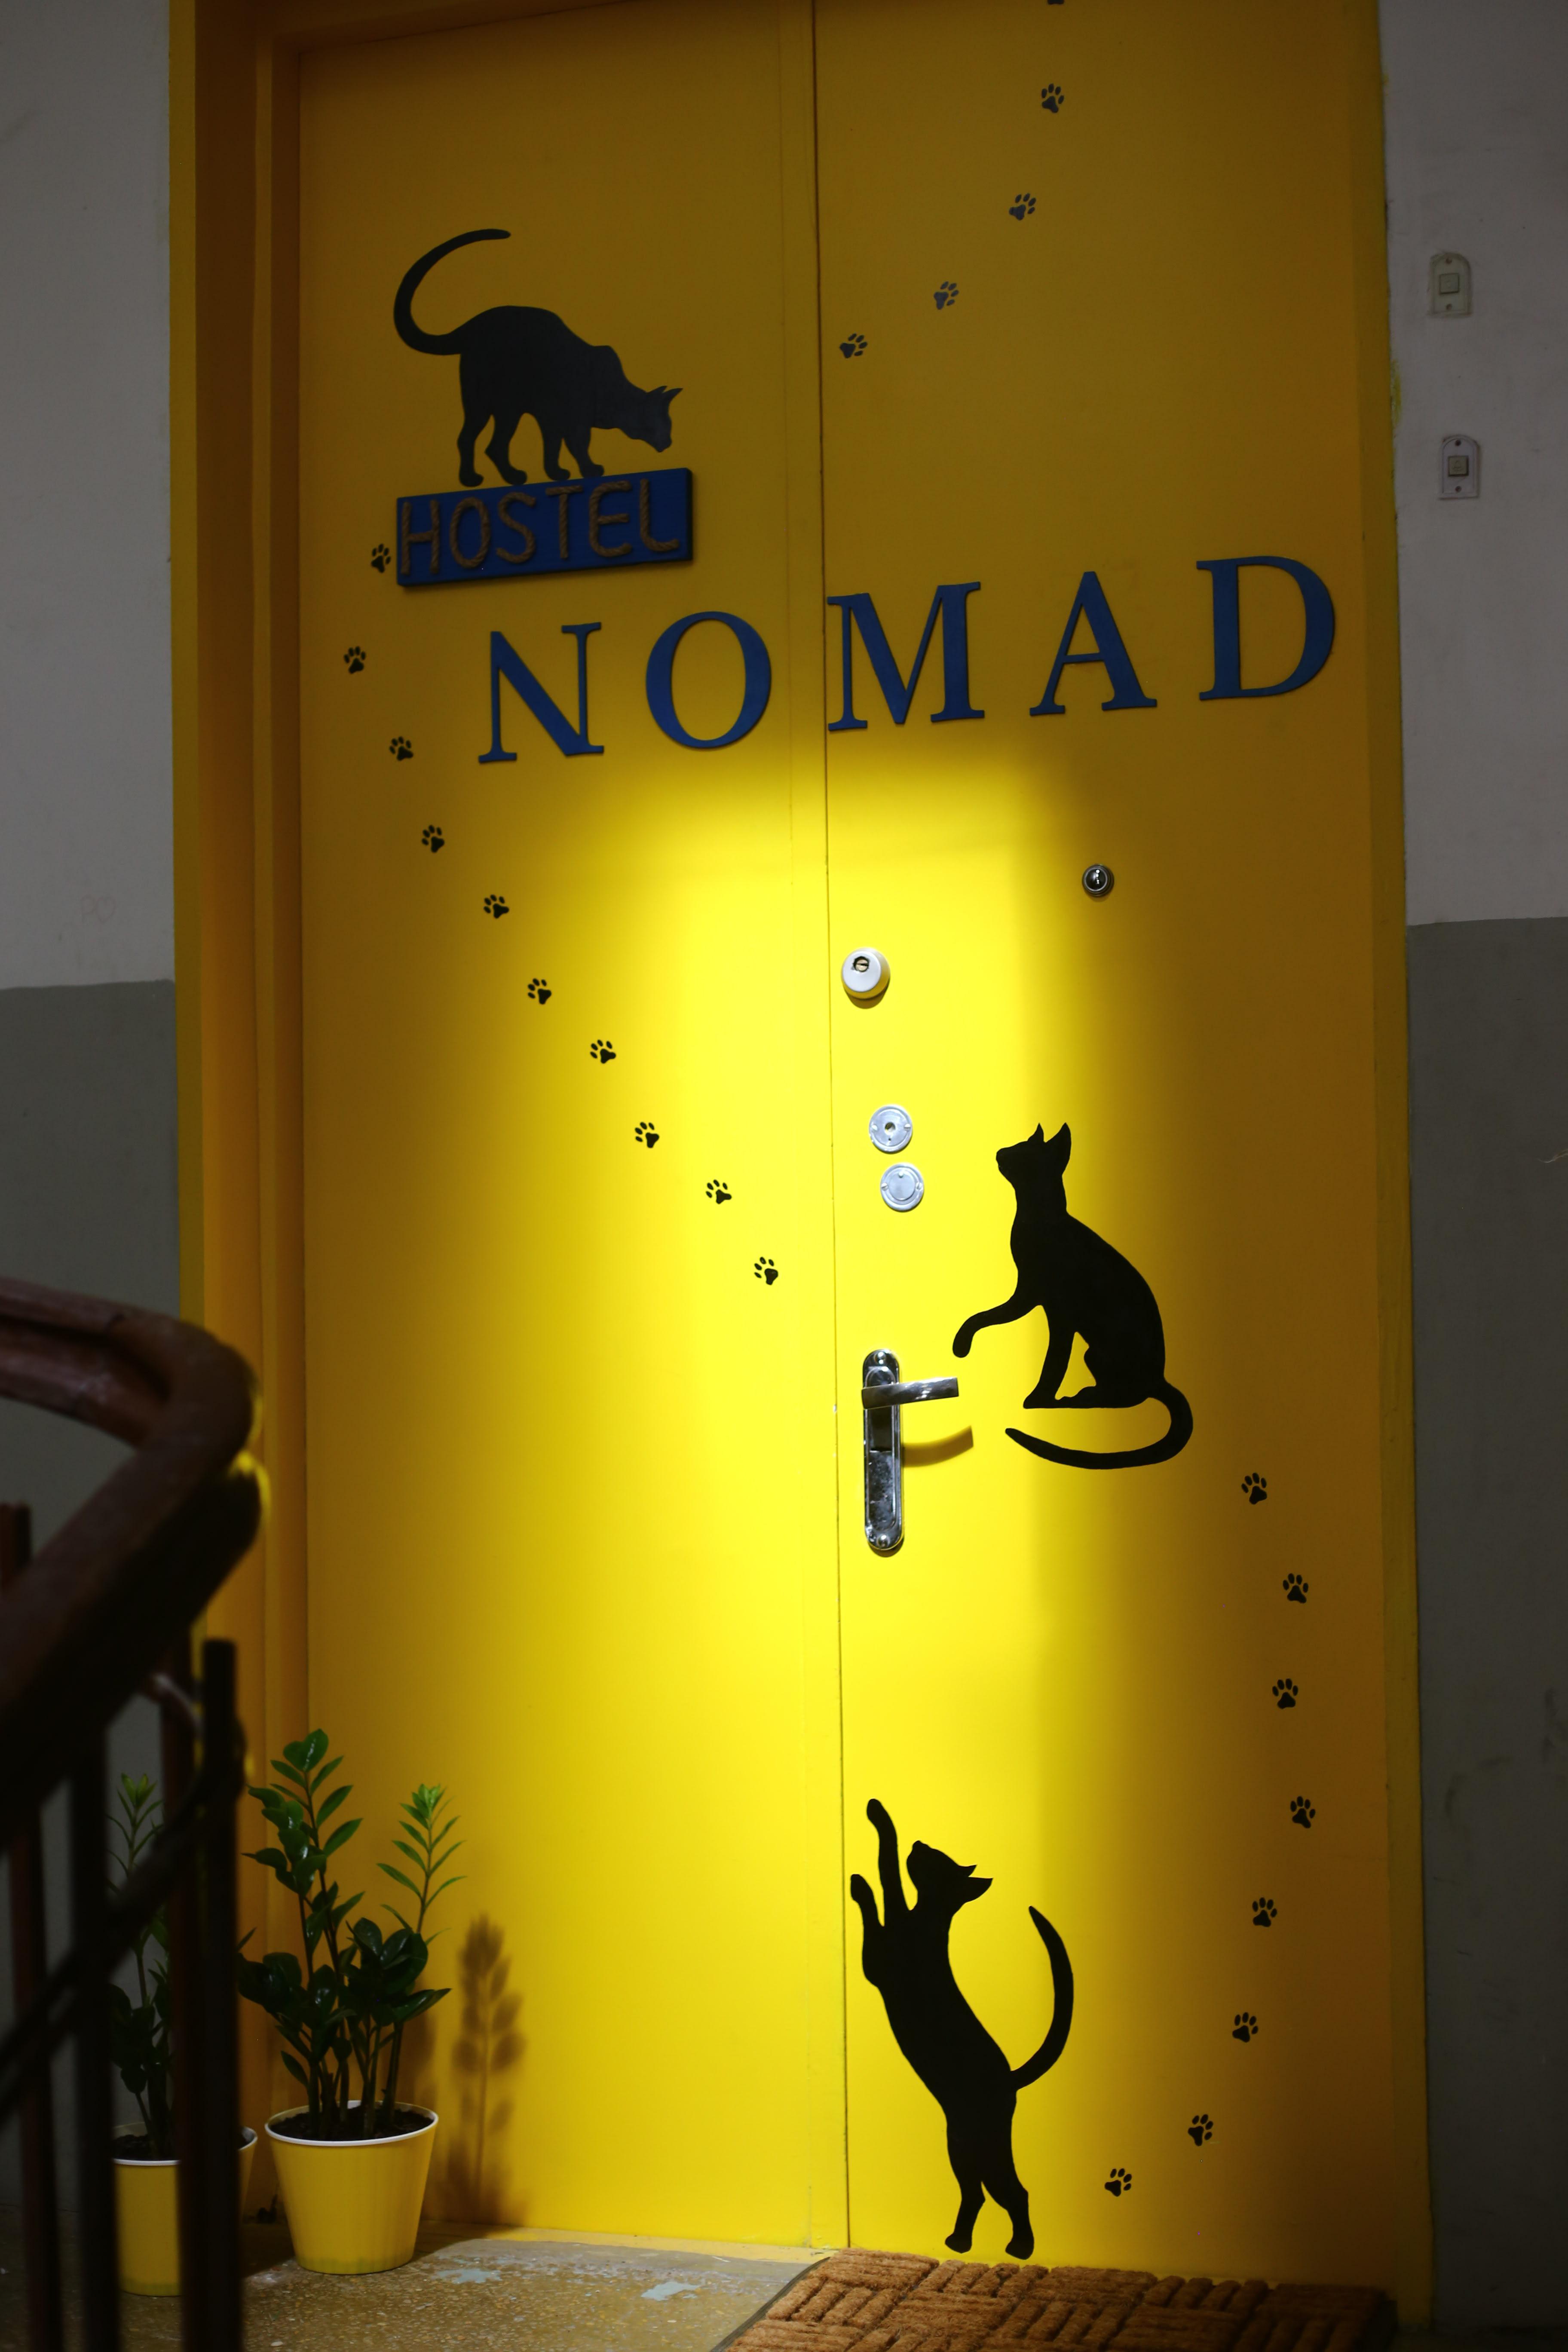 HOSTEL - Hostel Nomad